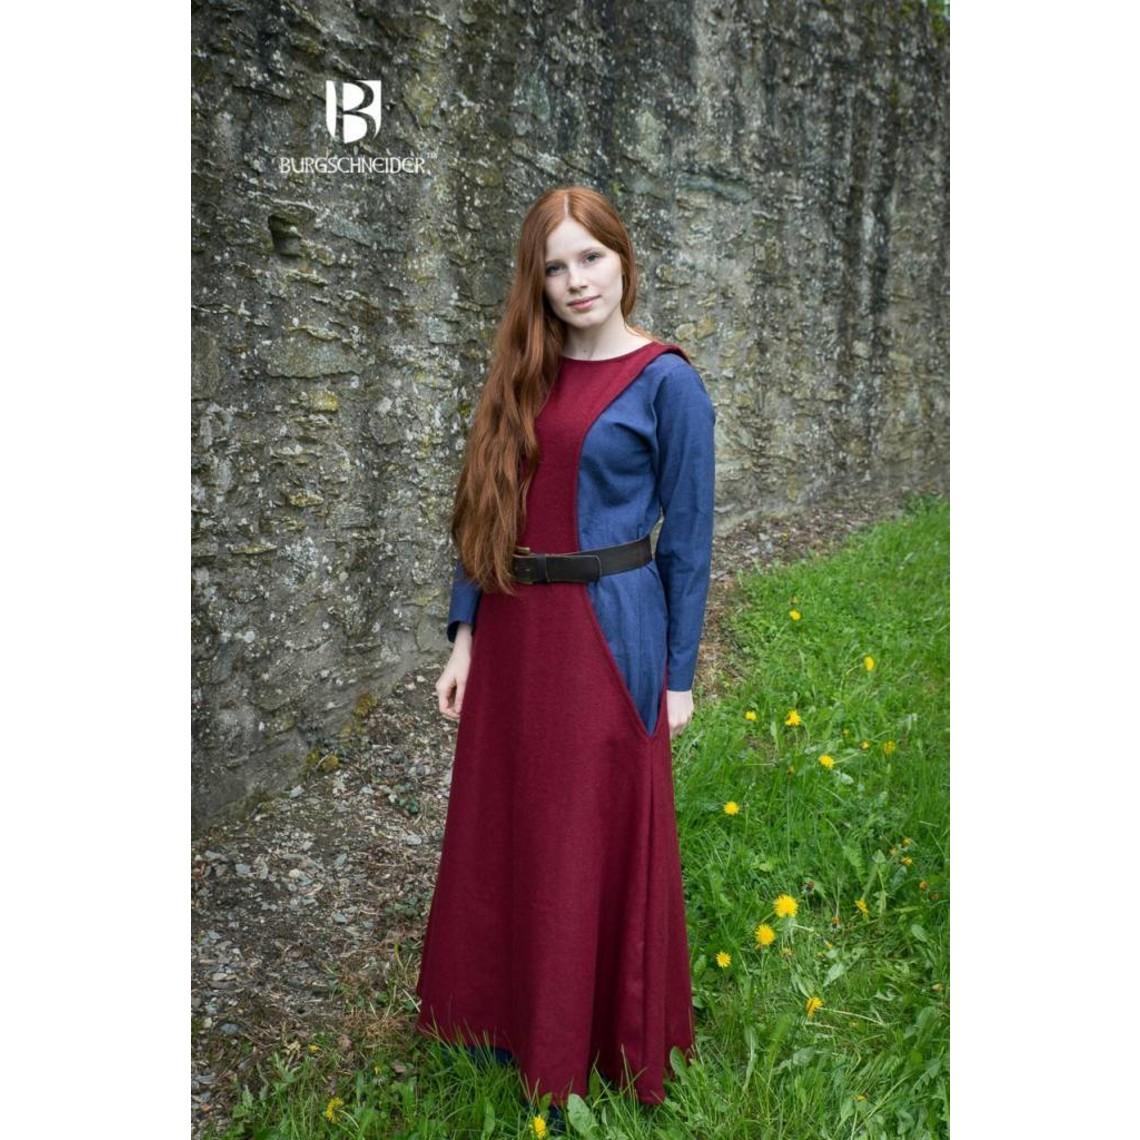 Burgschneider Surcoat Albrun red